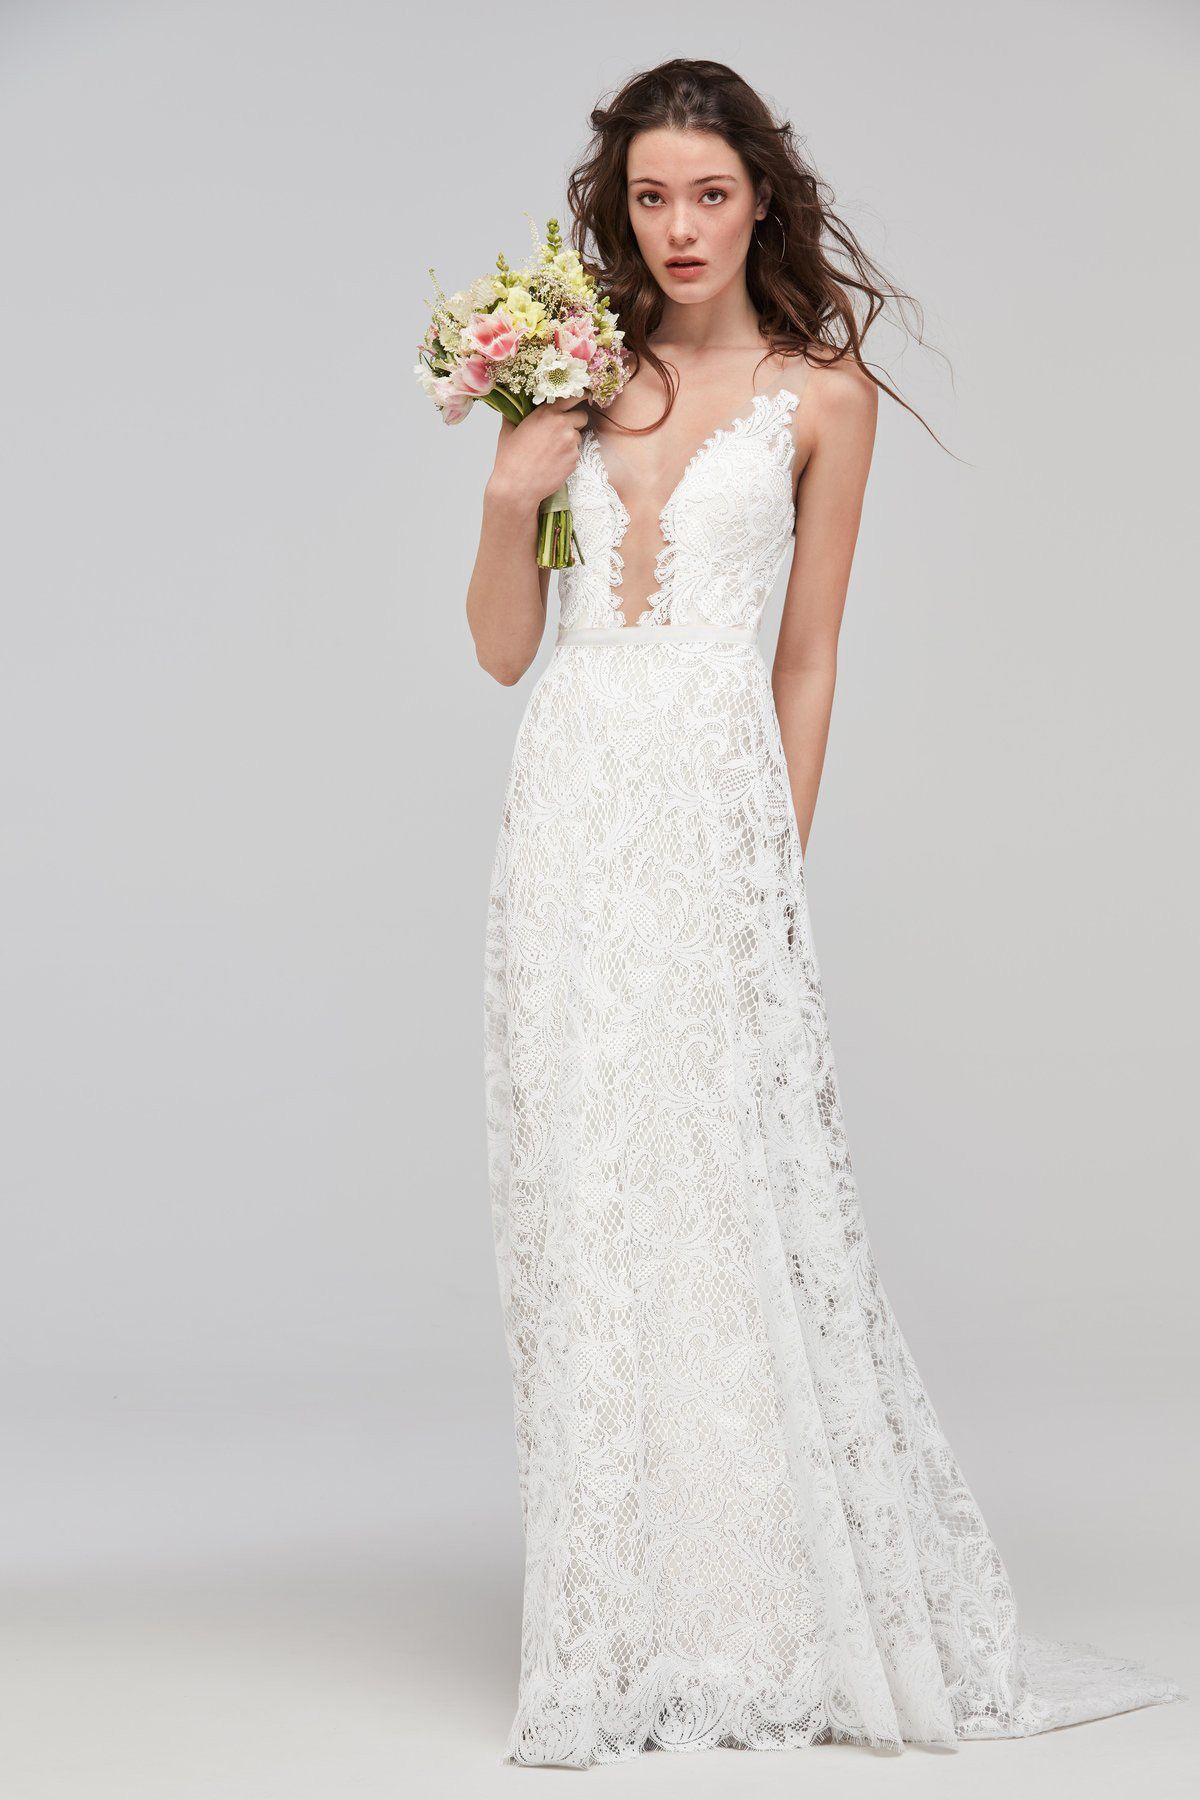 Asa 59120 Brides Willowby By Watters Watters Wedding Dress